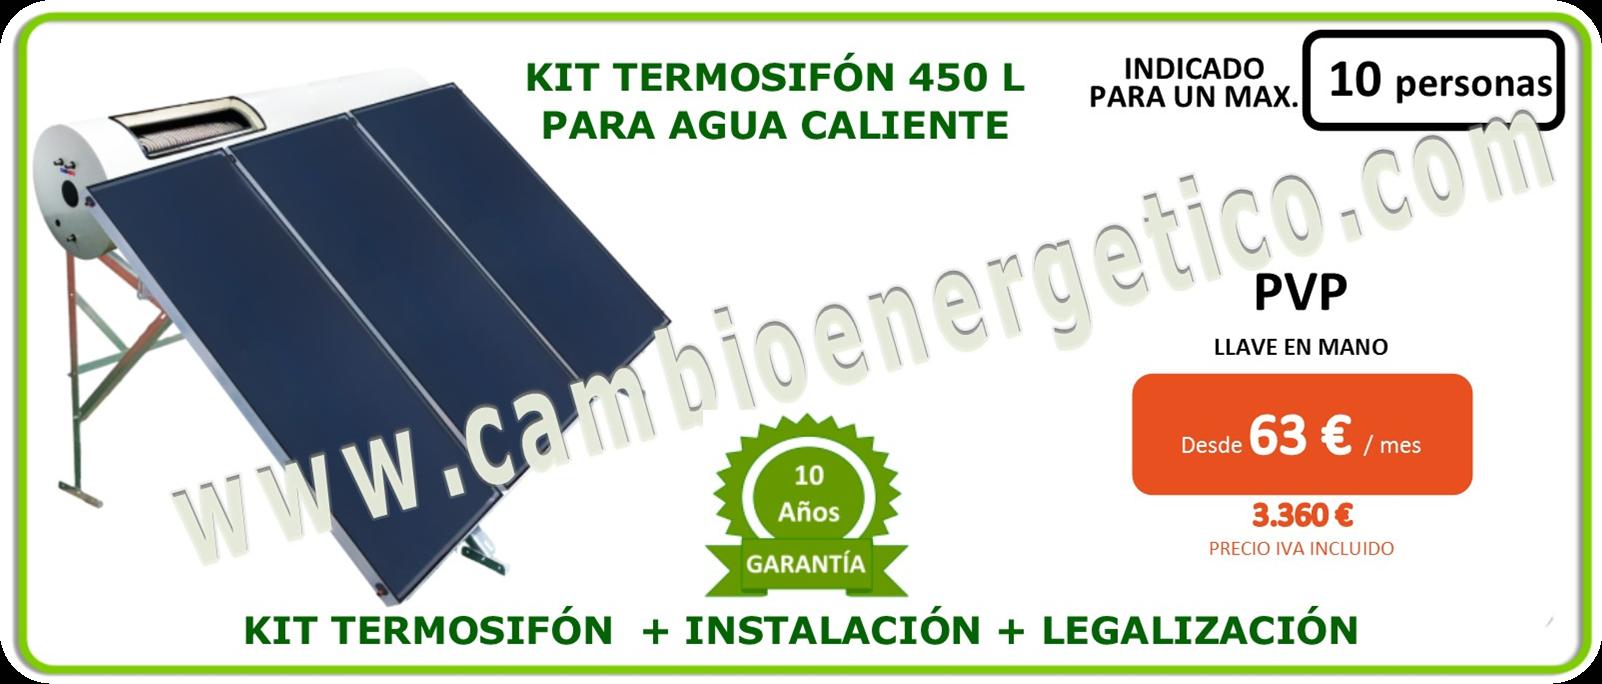 Kit termosifon 450 l